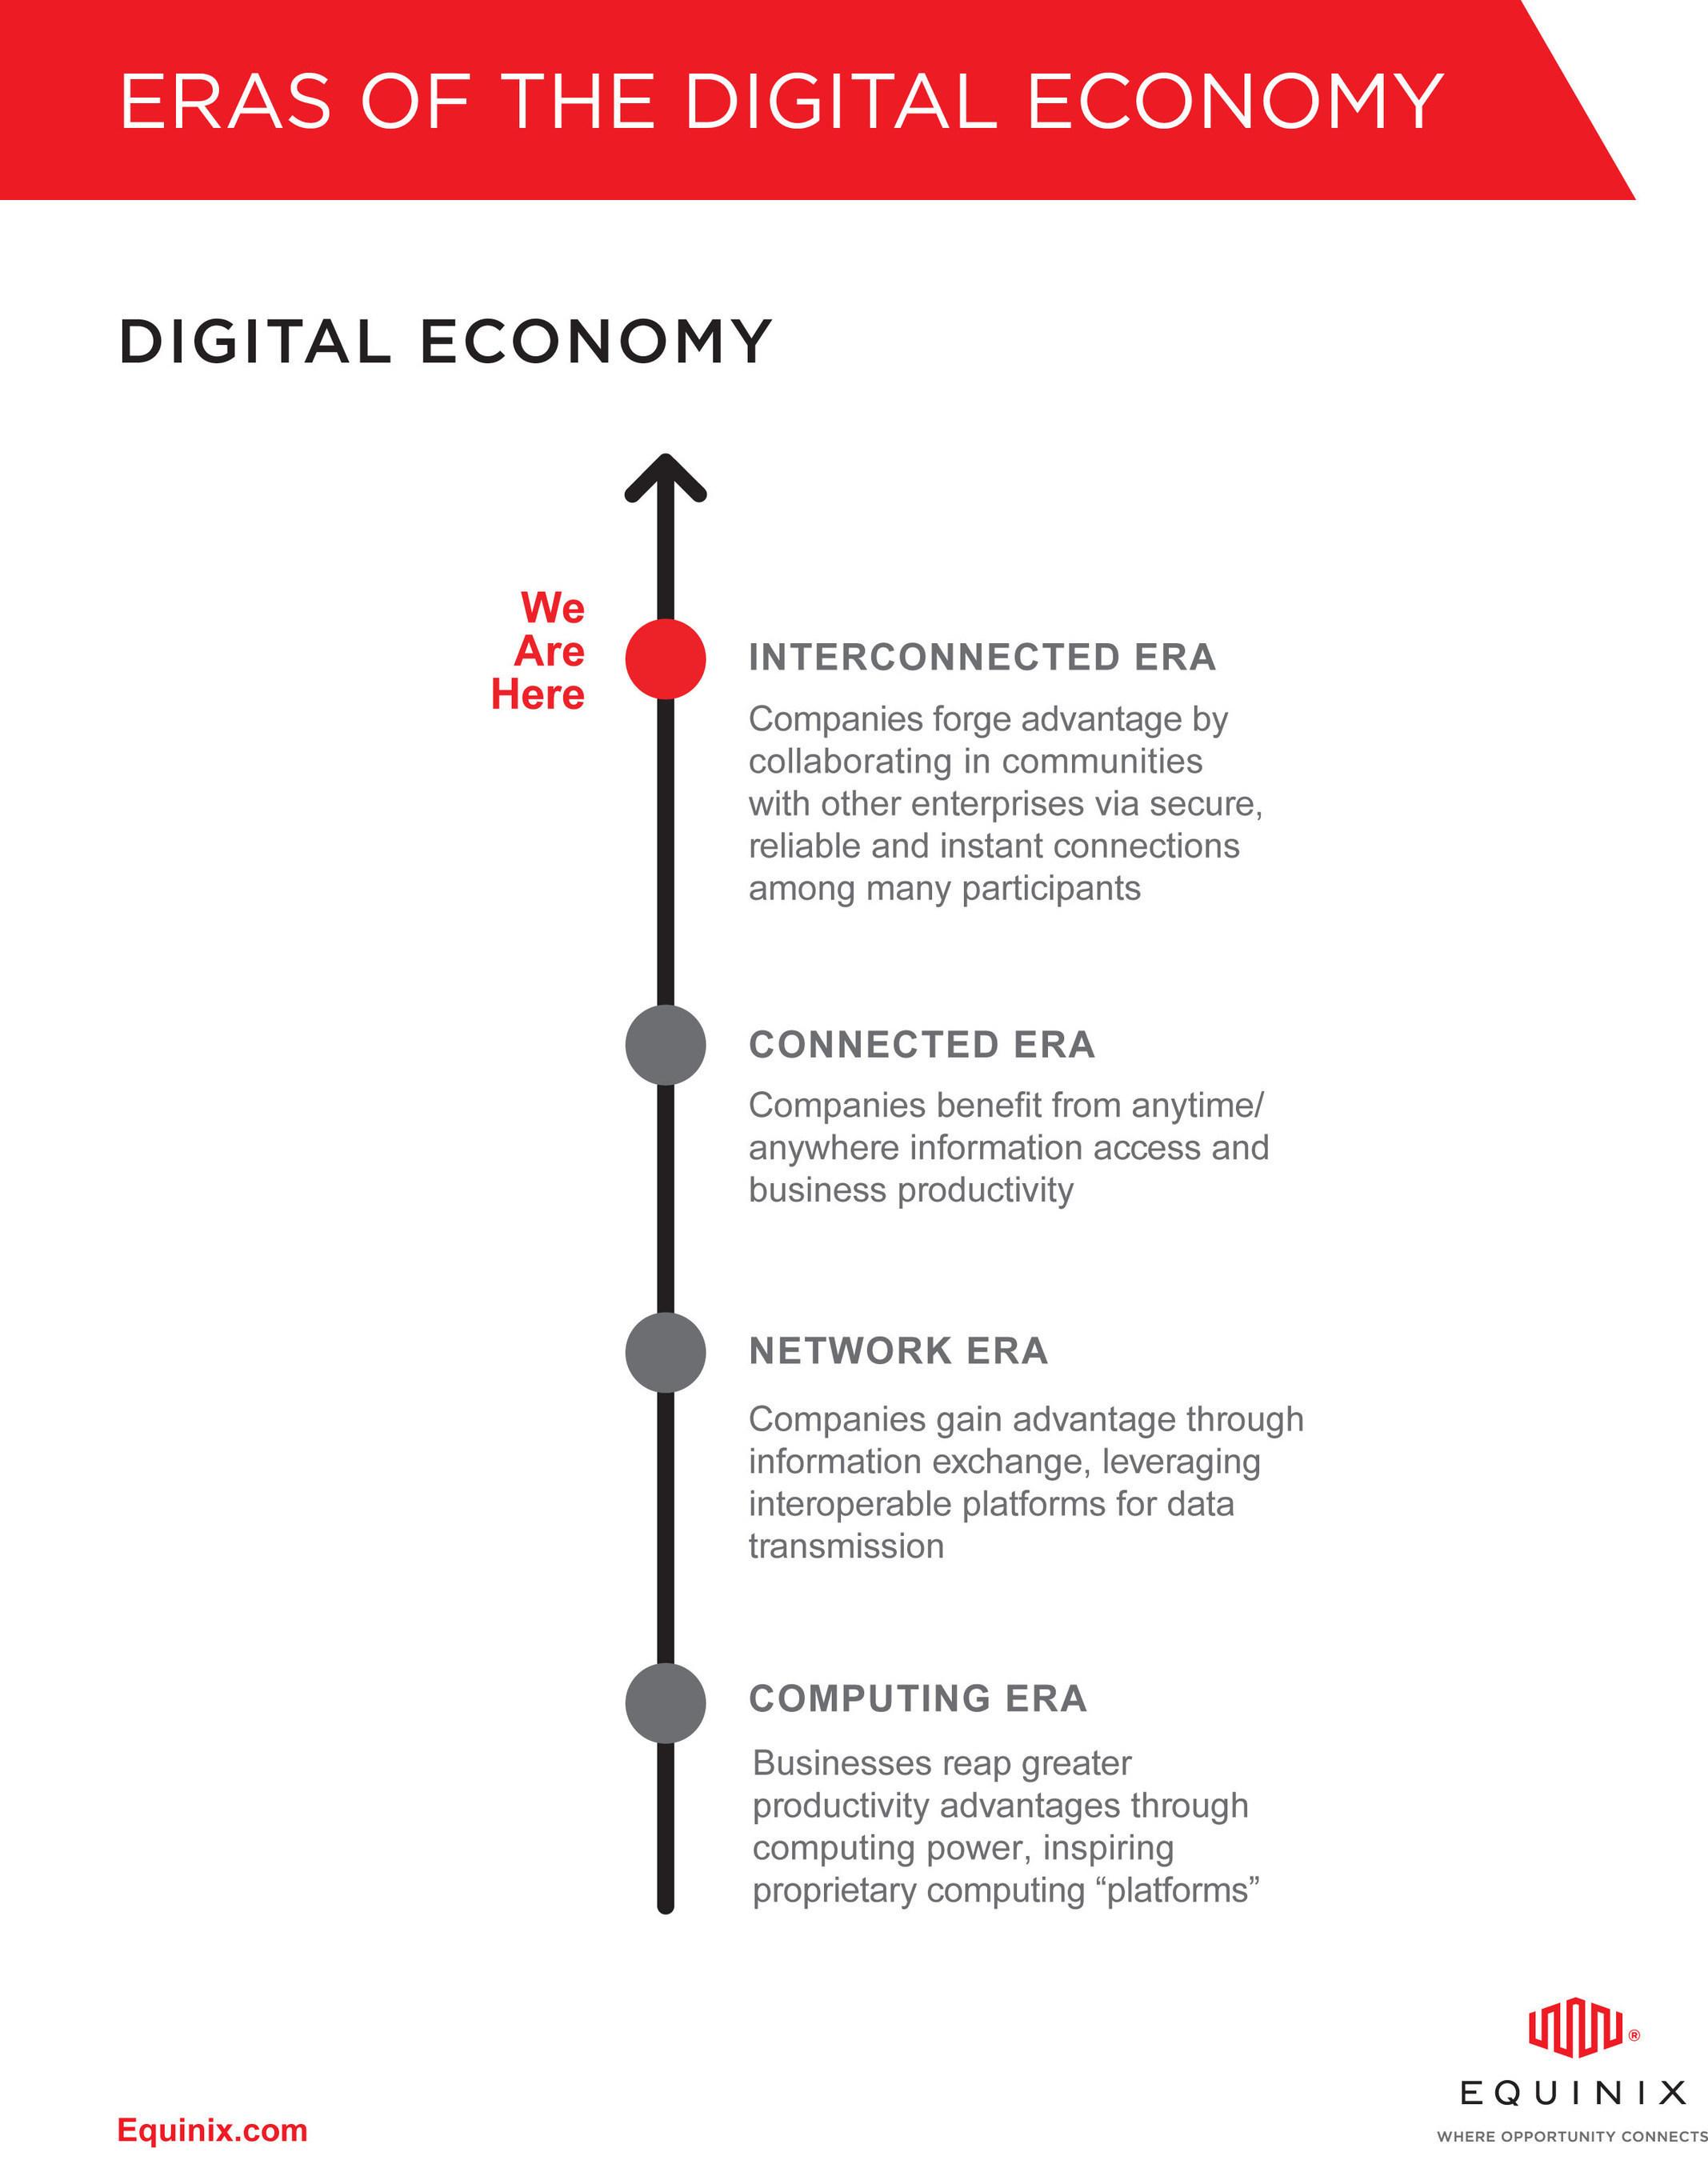 Eras of the Digital Economy